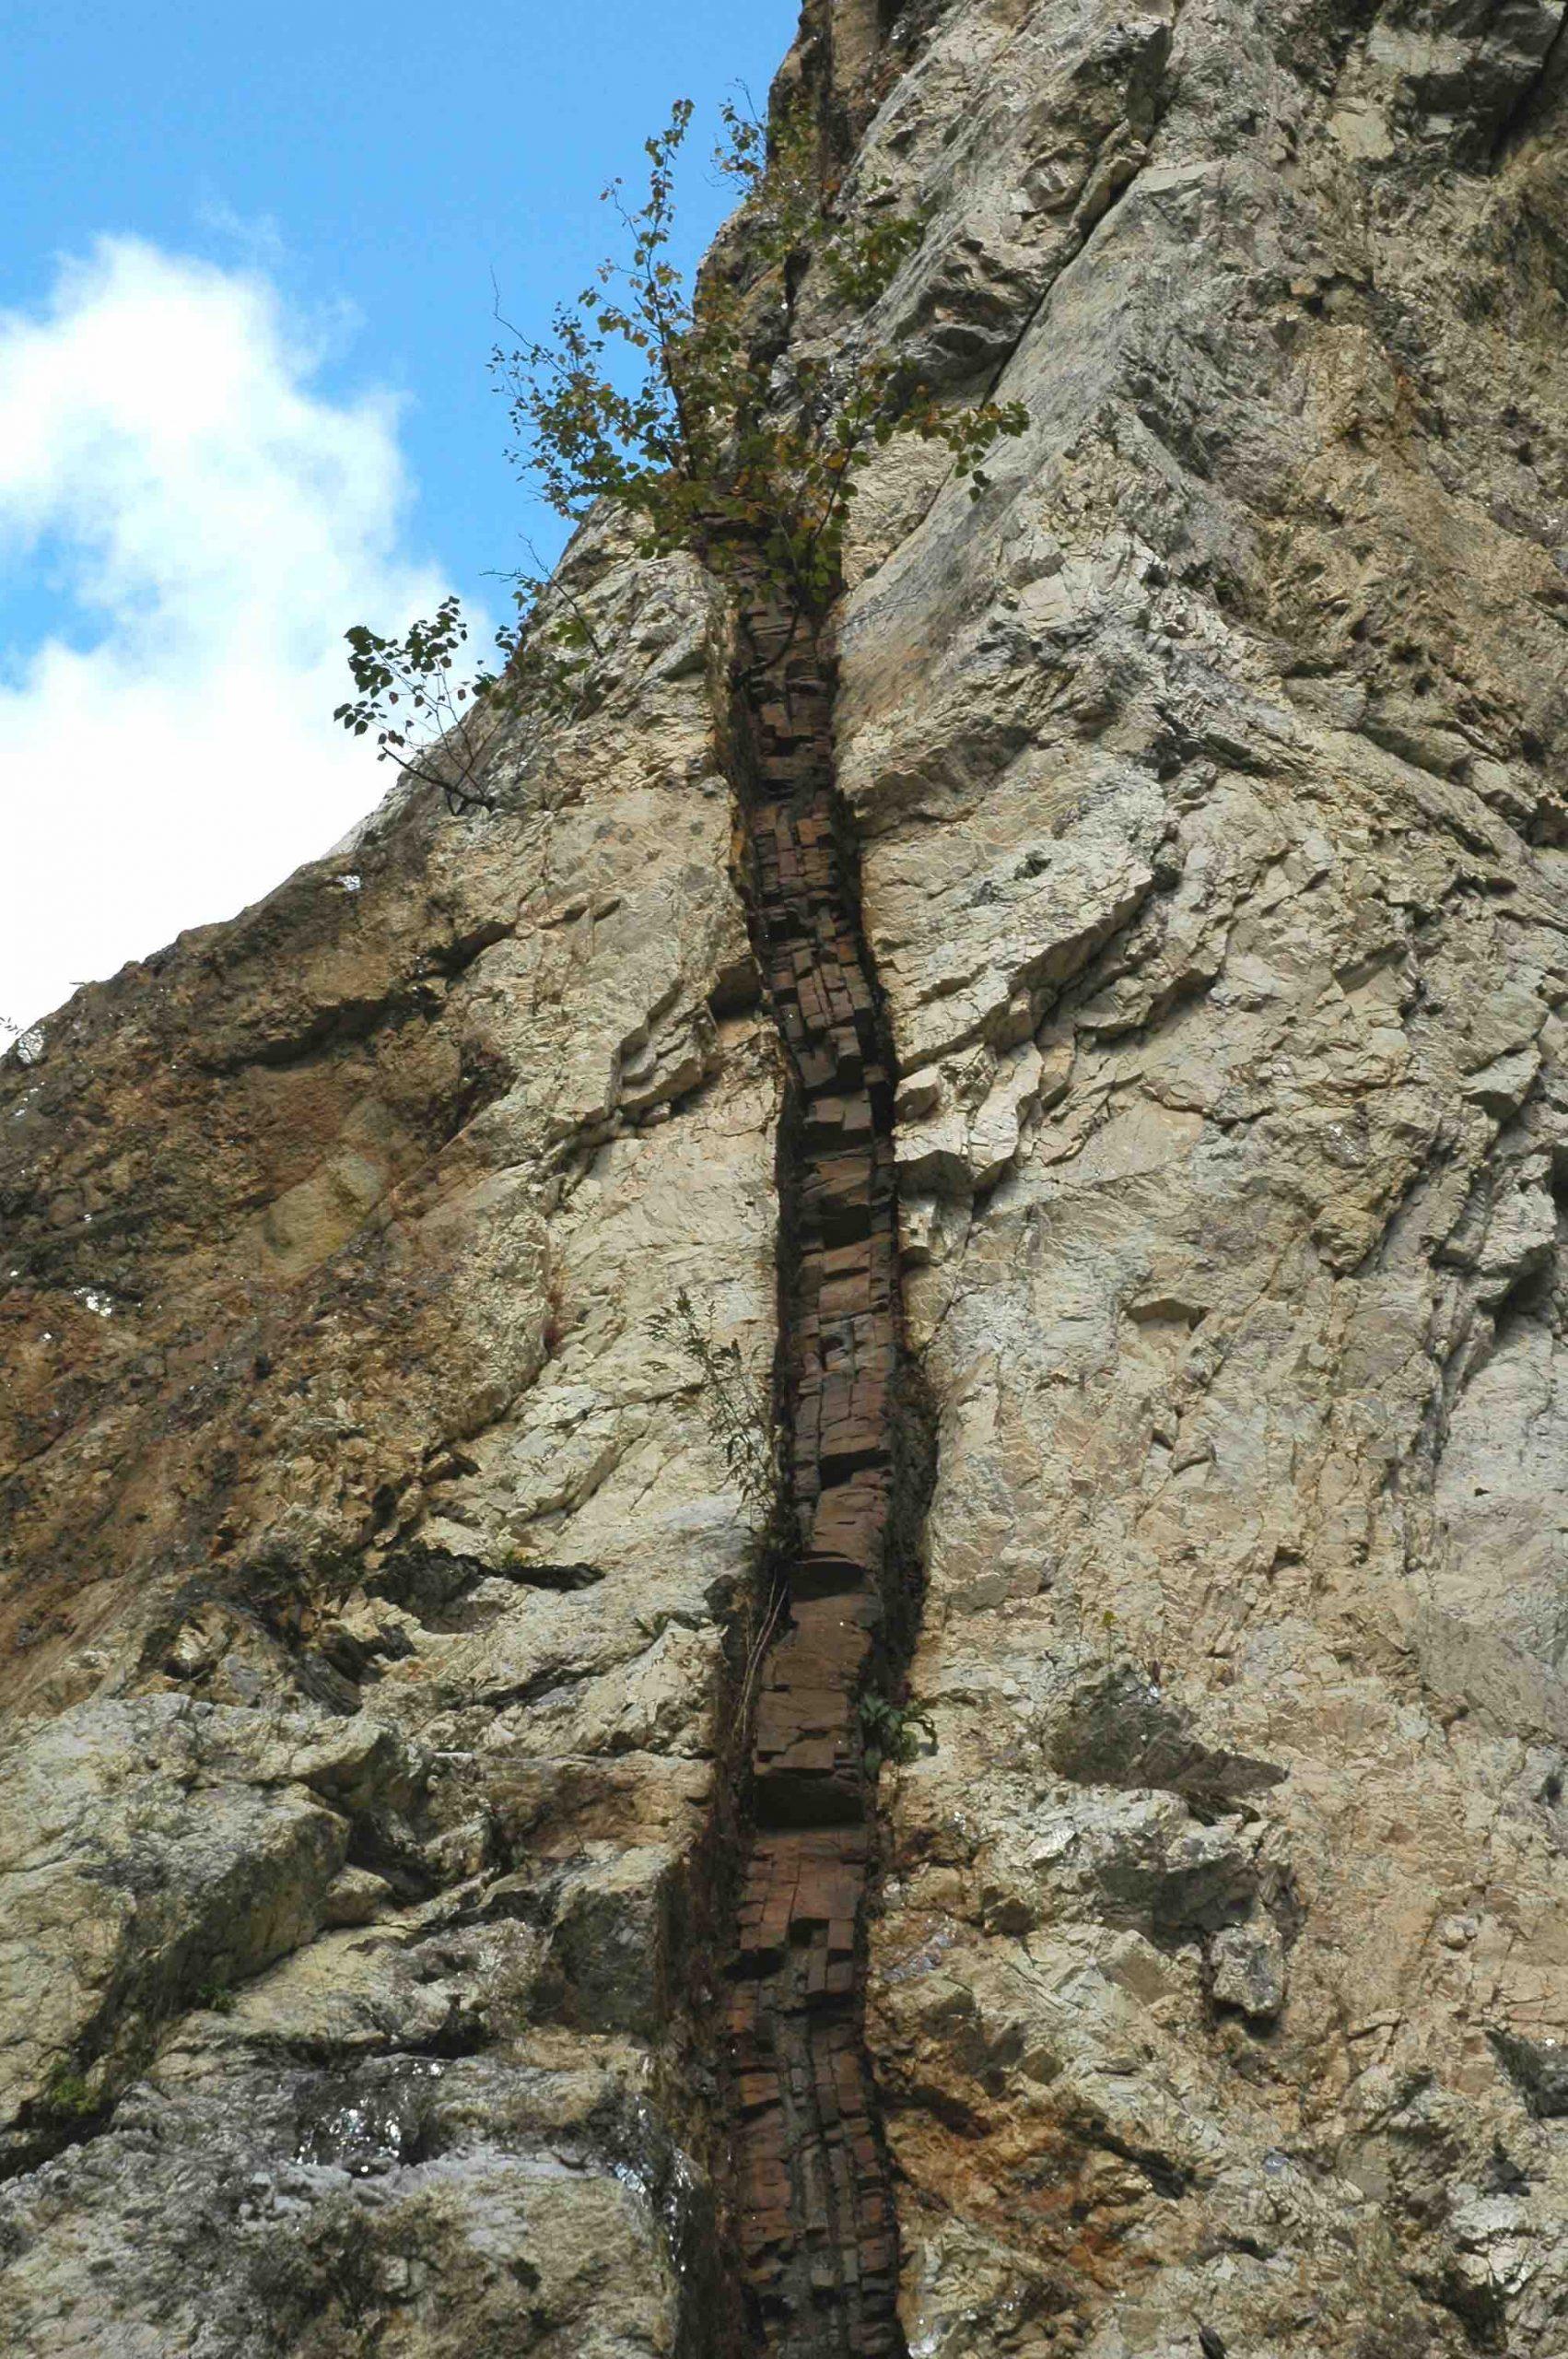 A mafic dike cutting through granitic pegmatite in Ruggle's Mine, New Hampshire.